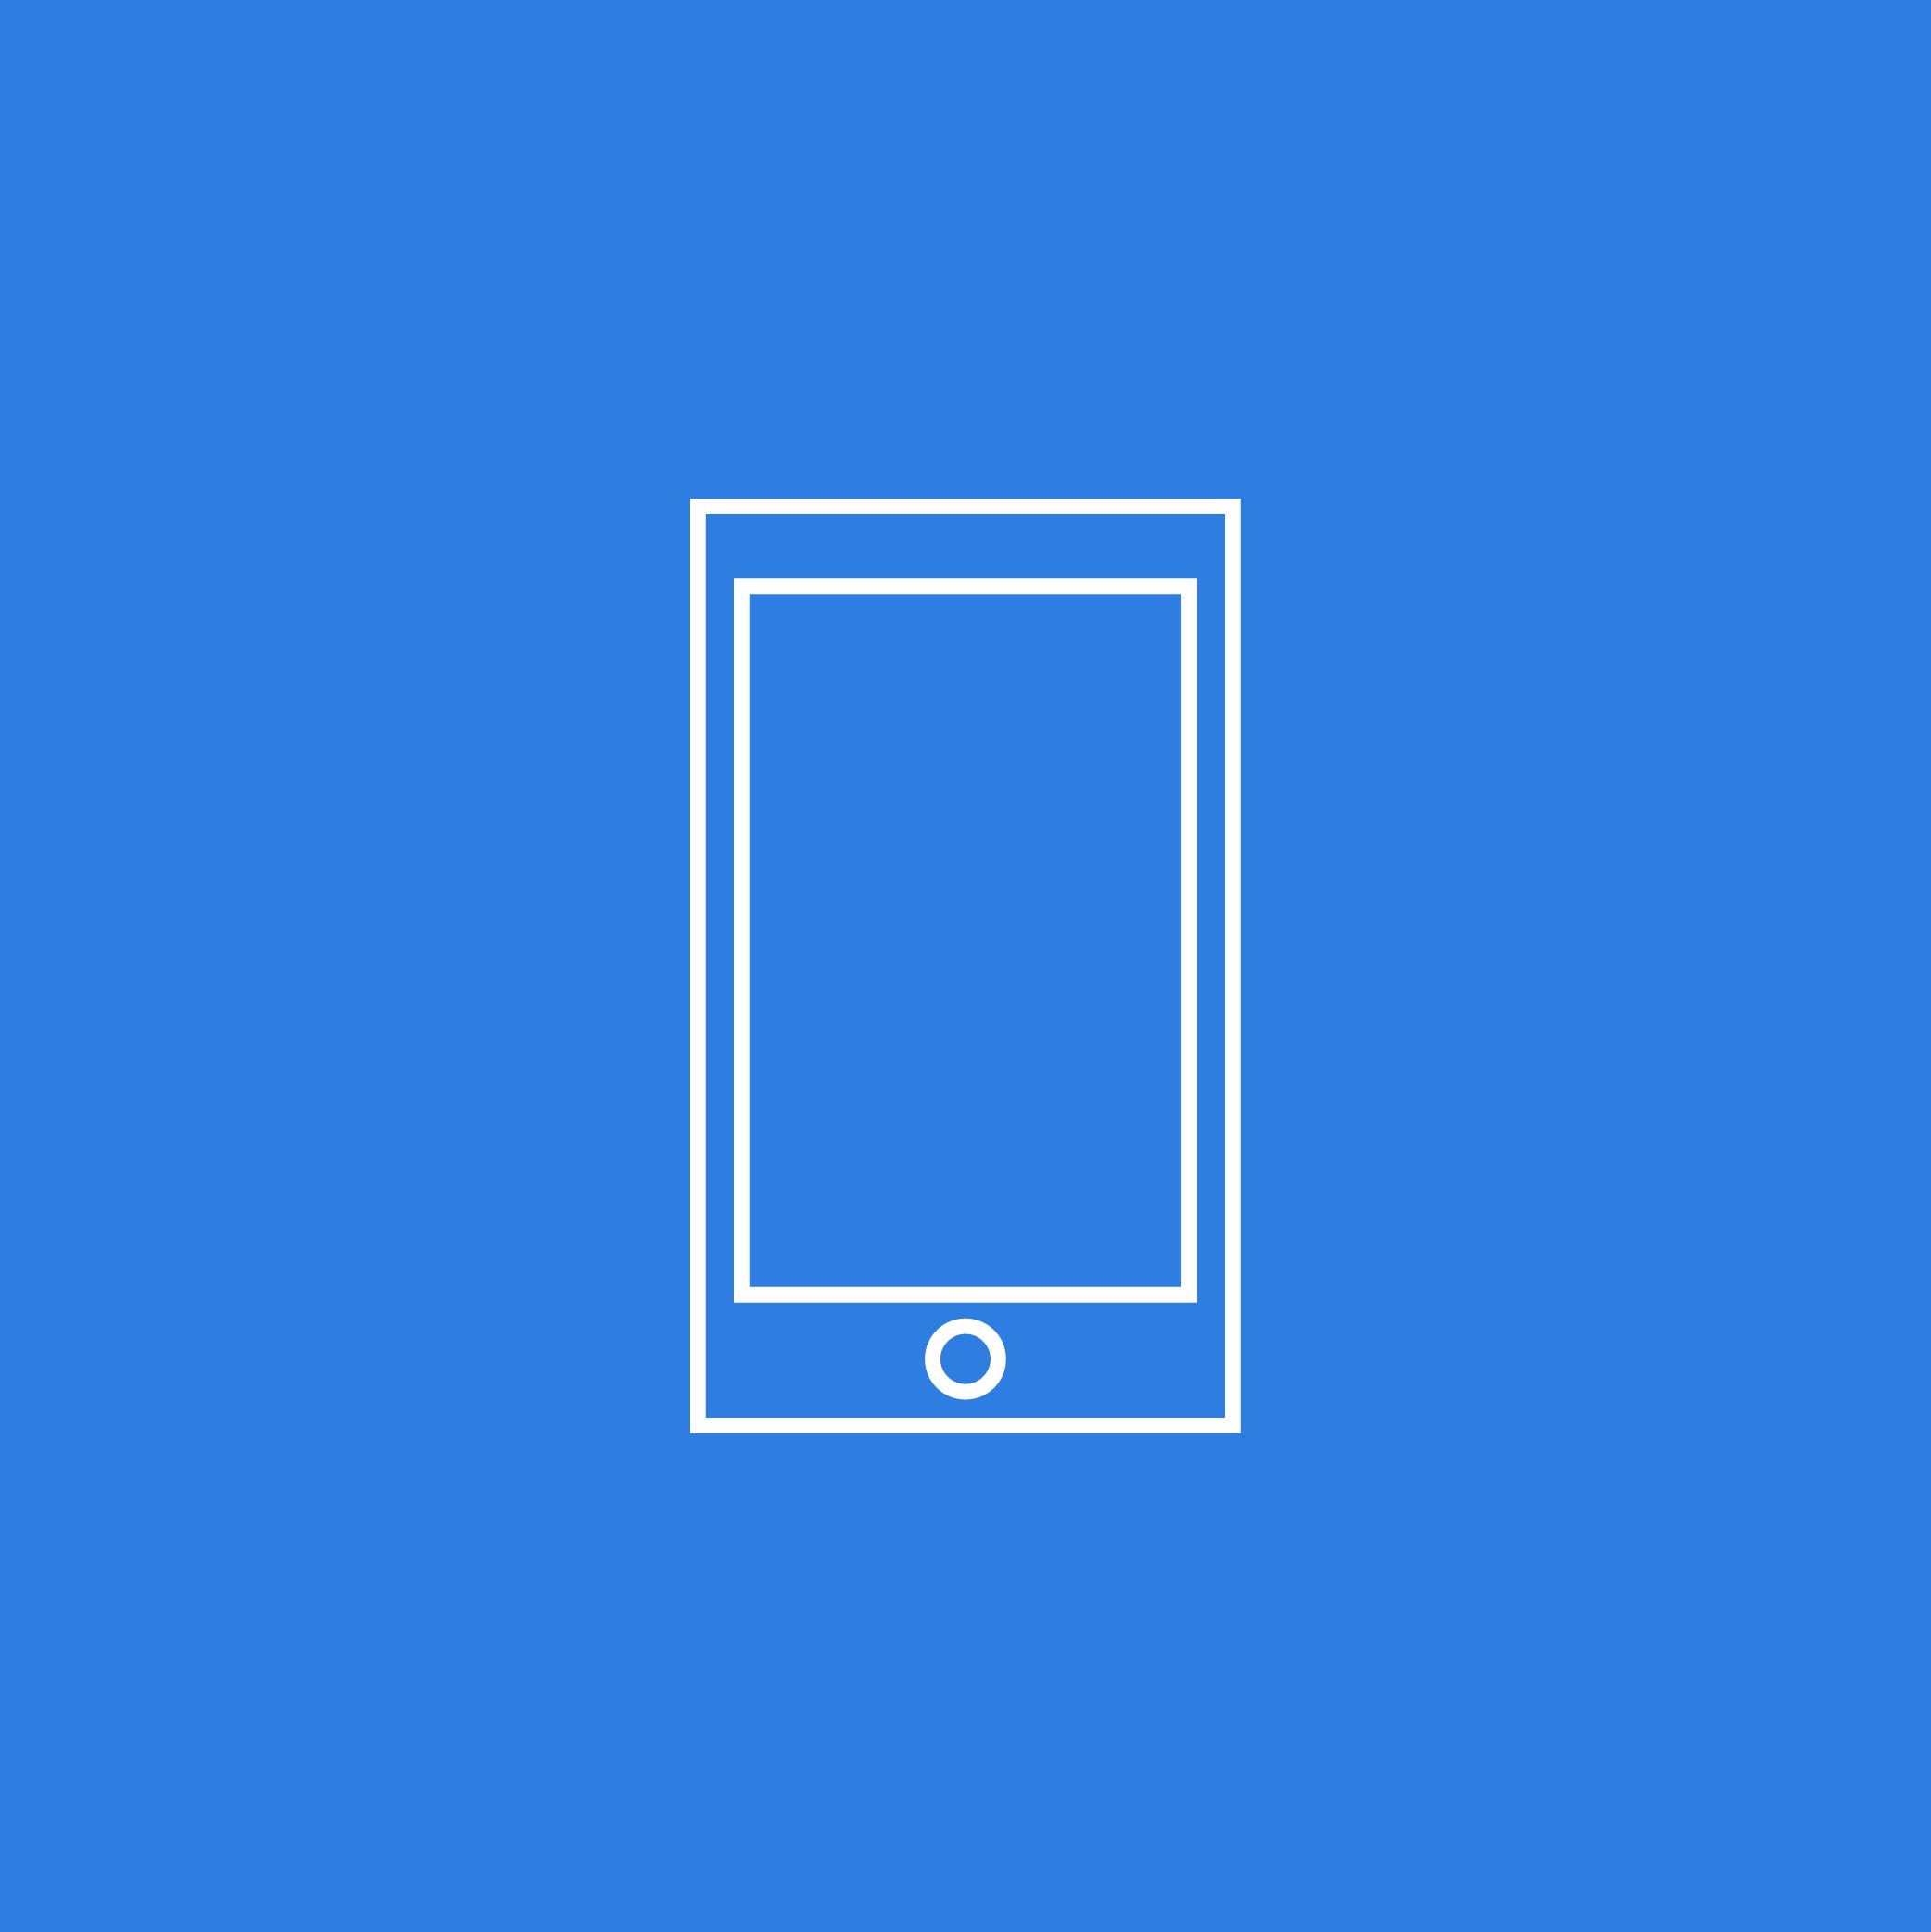 ico-etlinebcn_06-mobile_app_azul